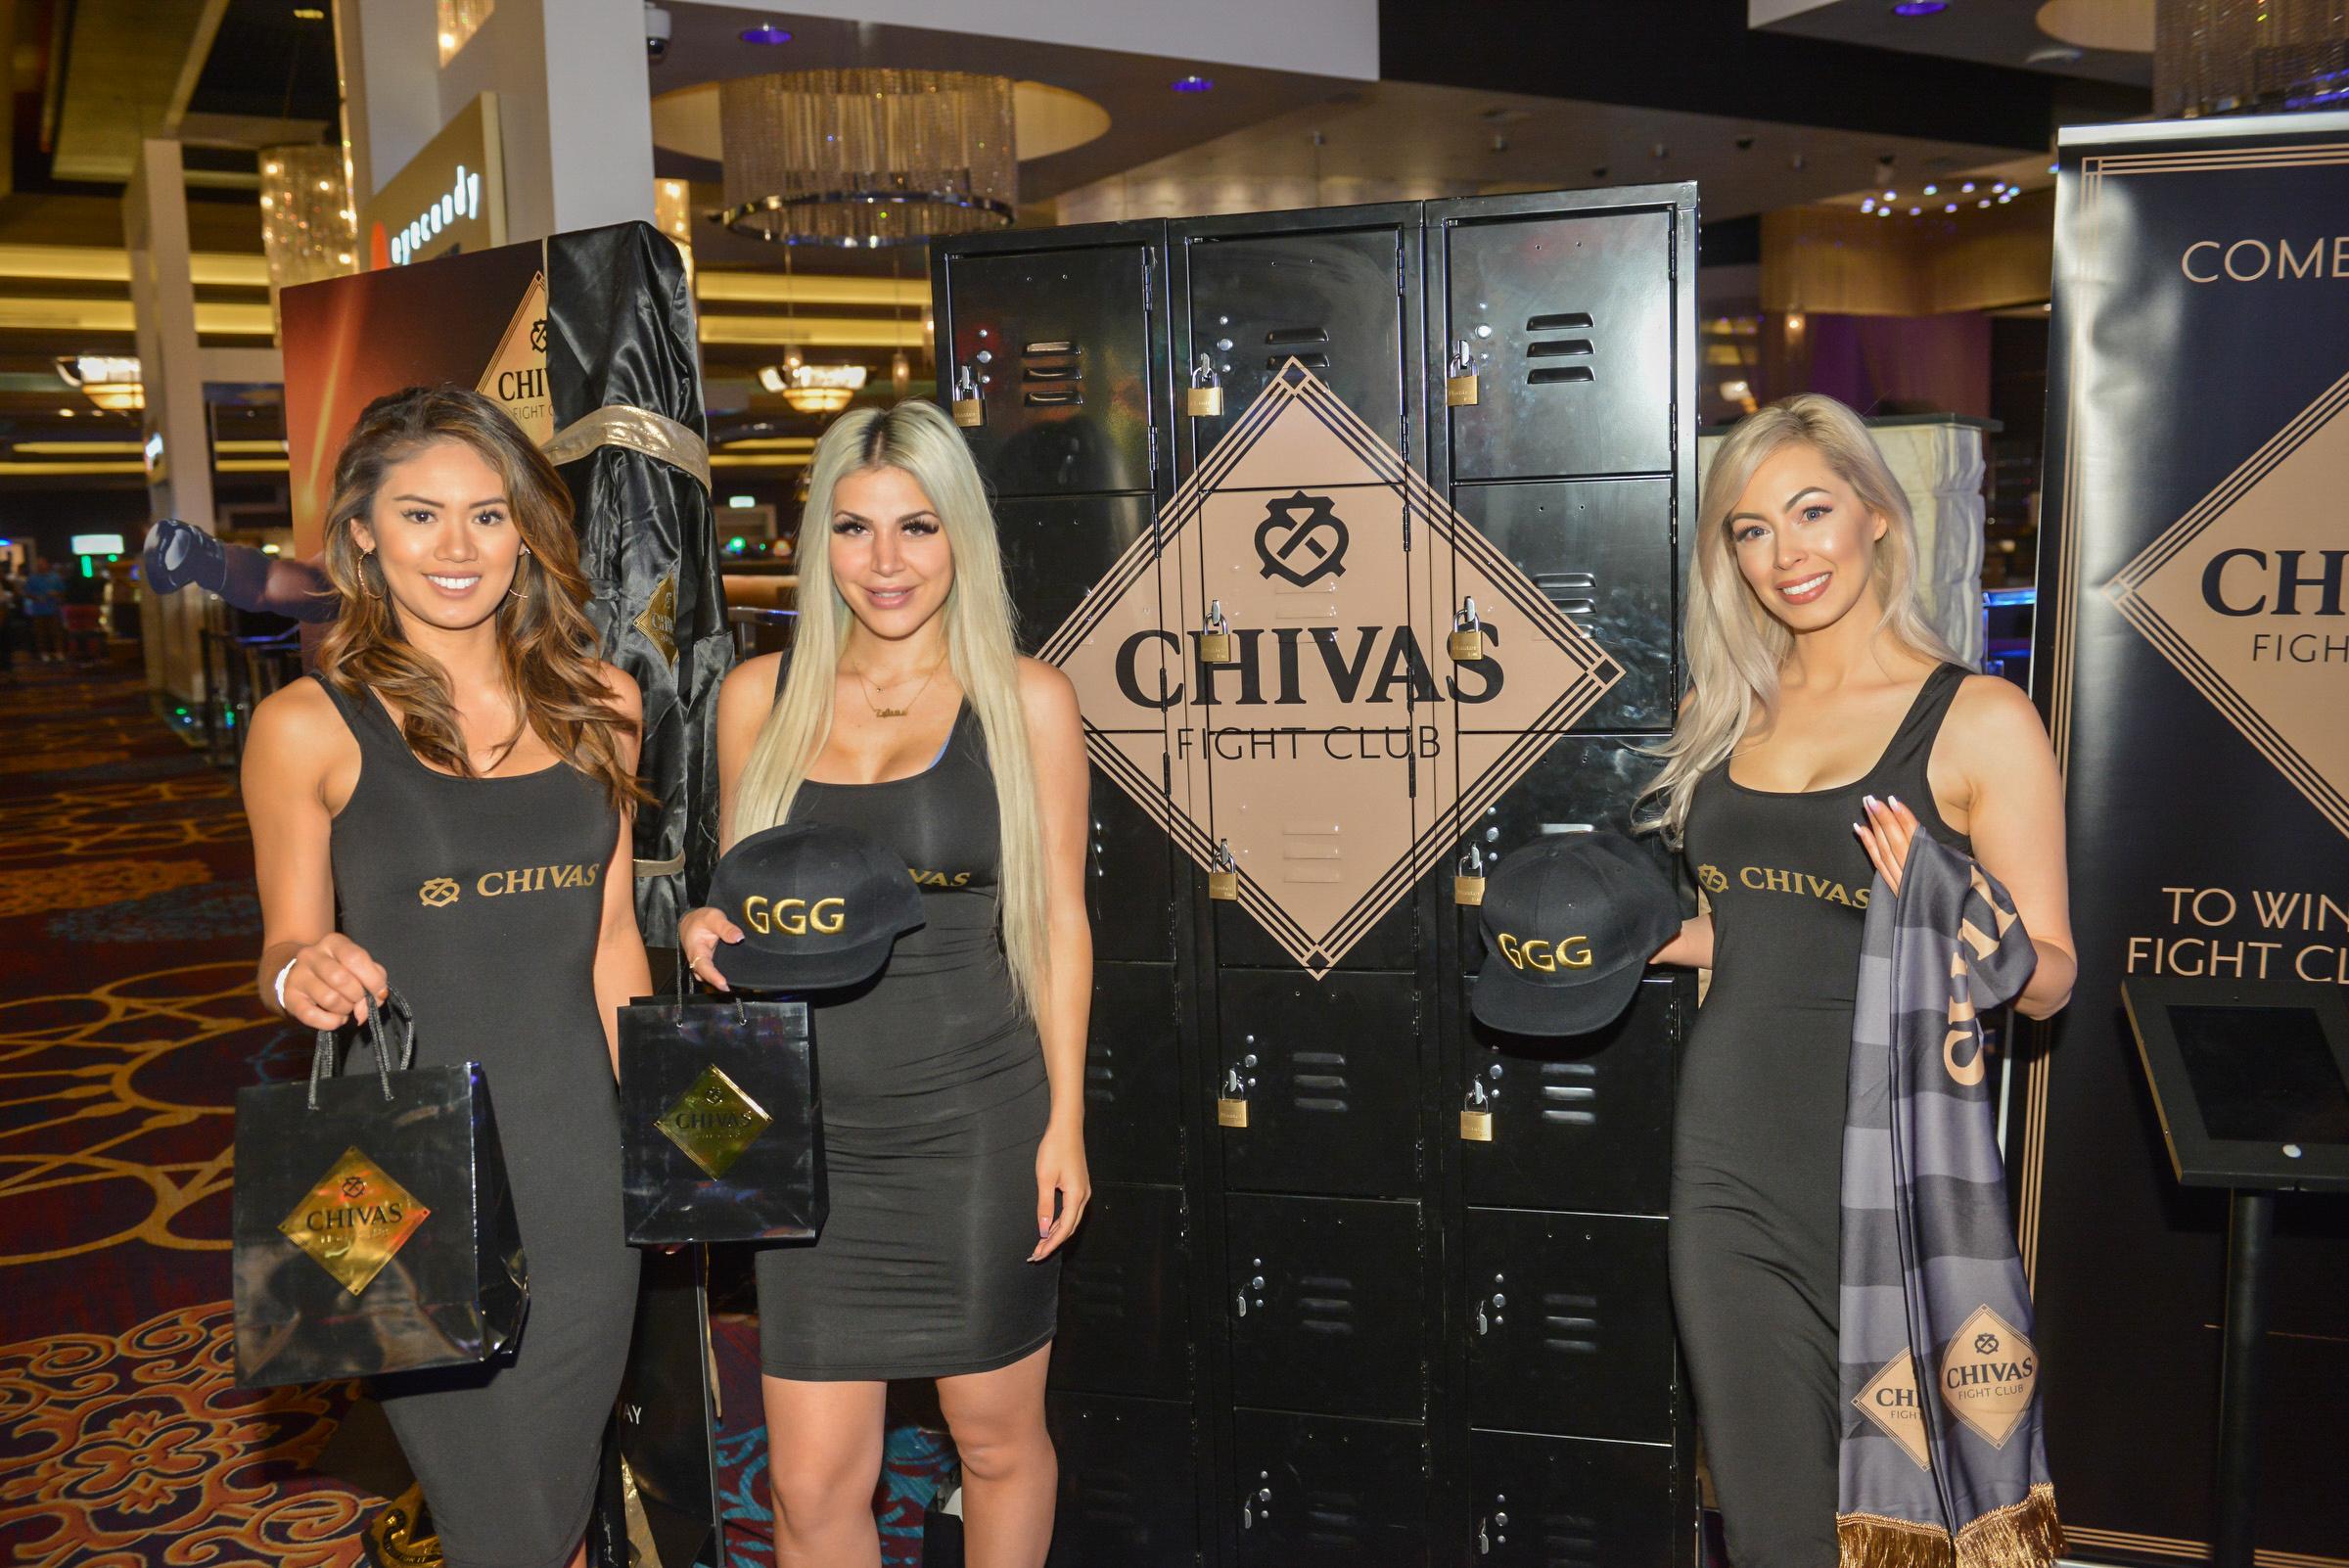 OHM-Chivas-GGG-Vegas-Top Selects-0136.jpg